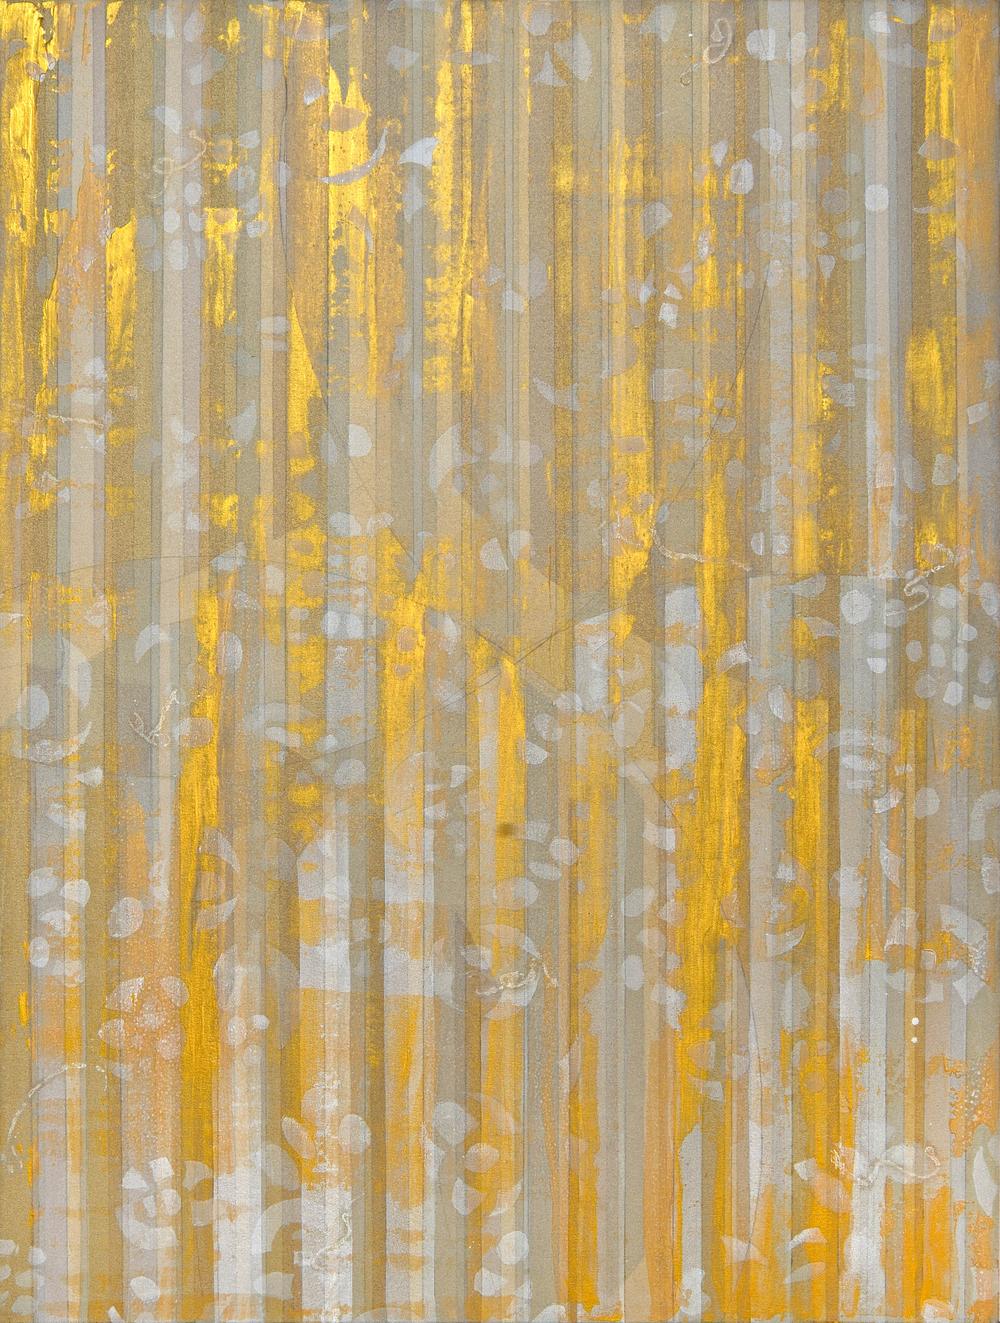 "Liminal Spaces  50 Elizabeth Chandler EC1045 Acrylic on Canvas 56"" x 42"""